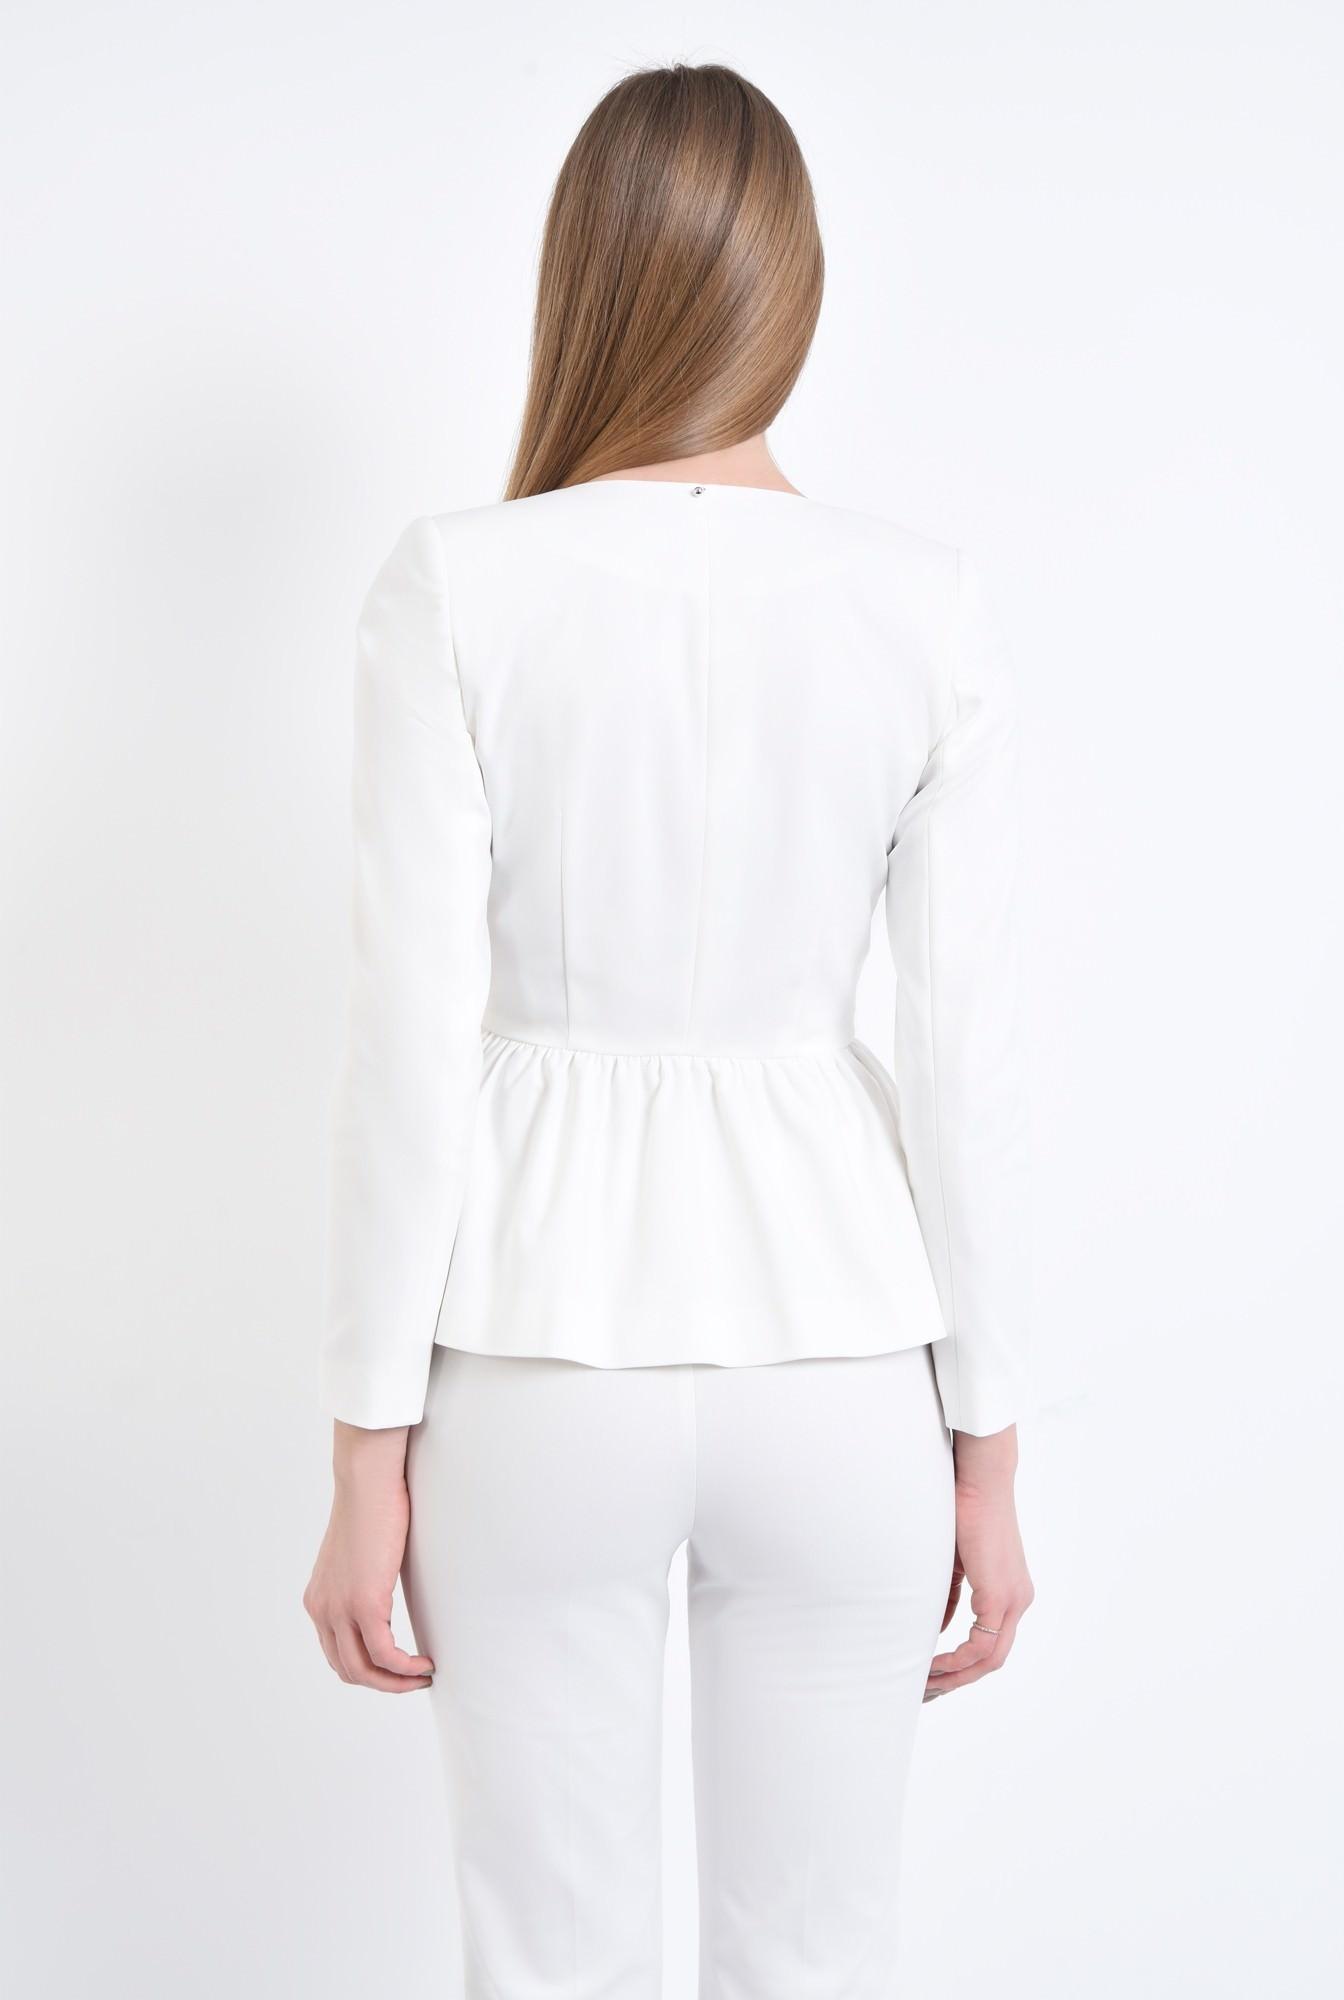 1 - 360 - Sacou casual alb, inchidere cu nasture decorativ